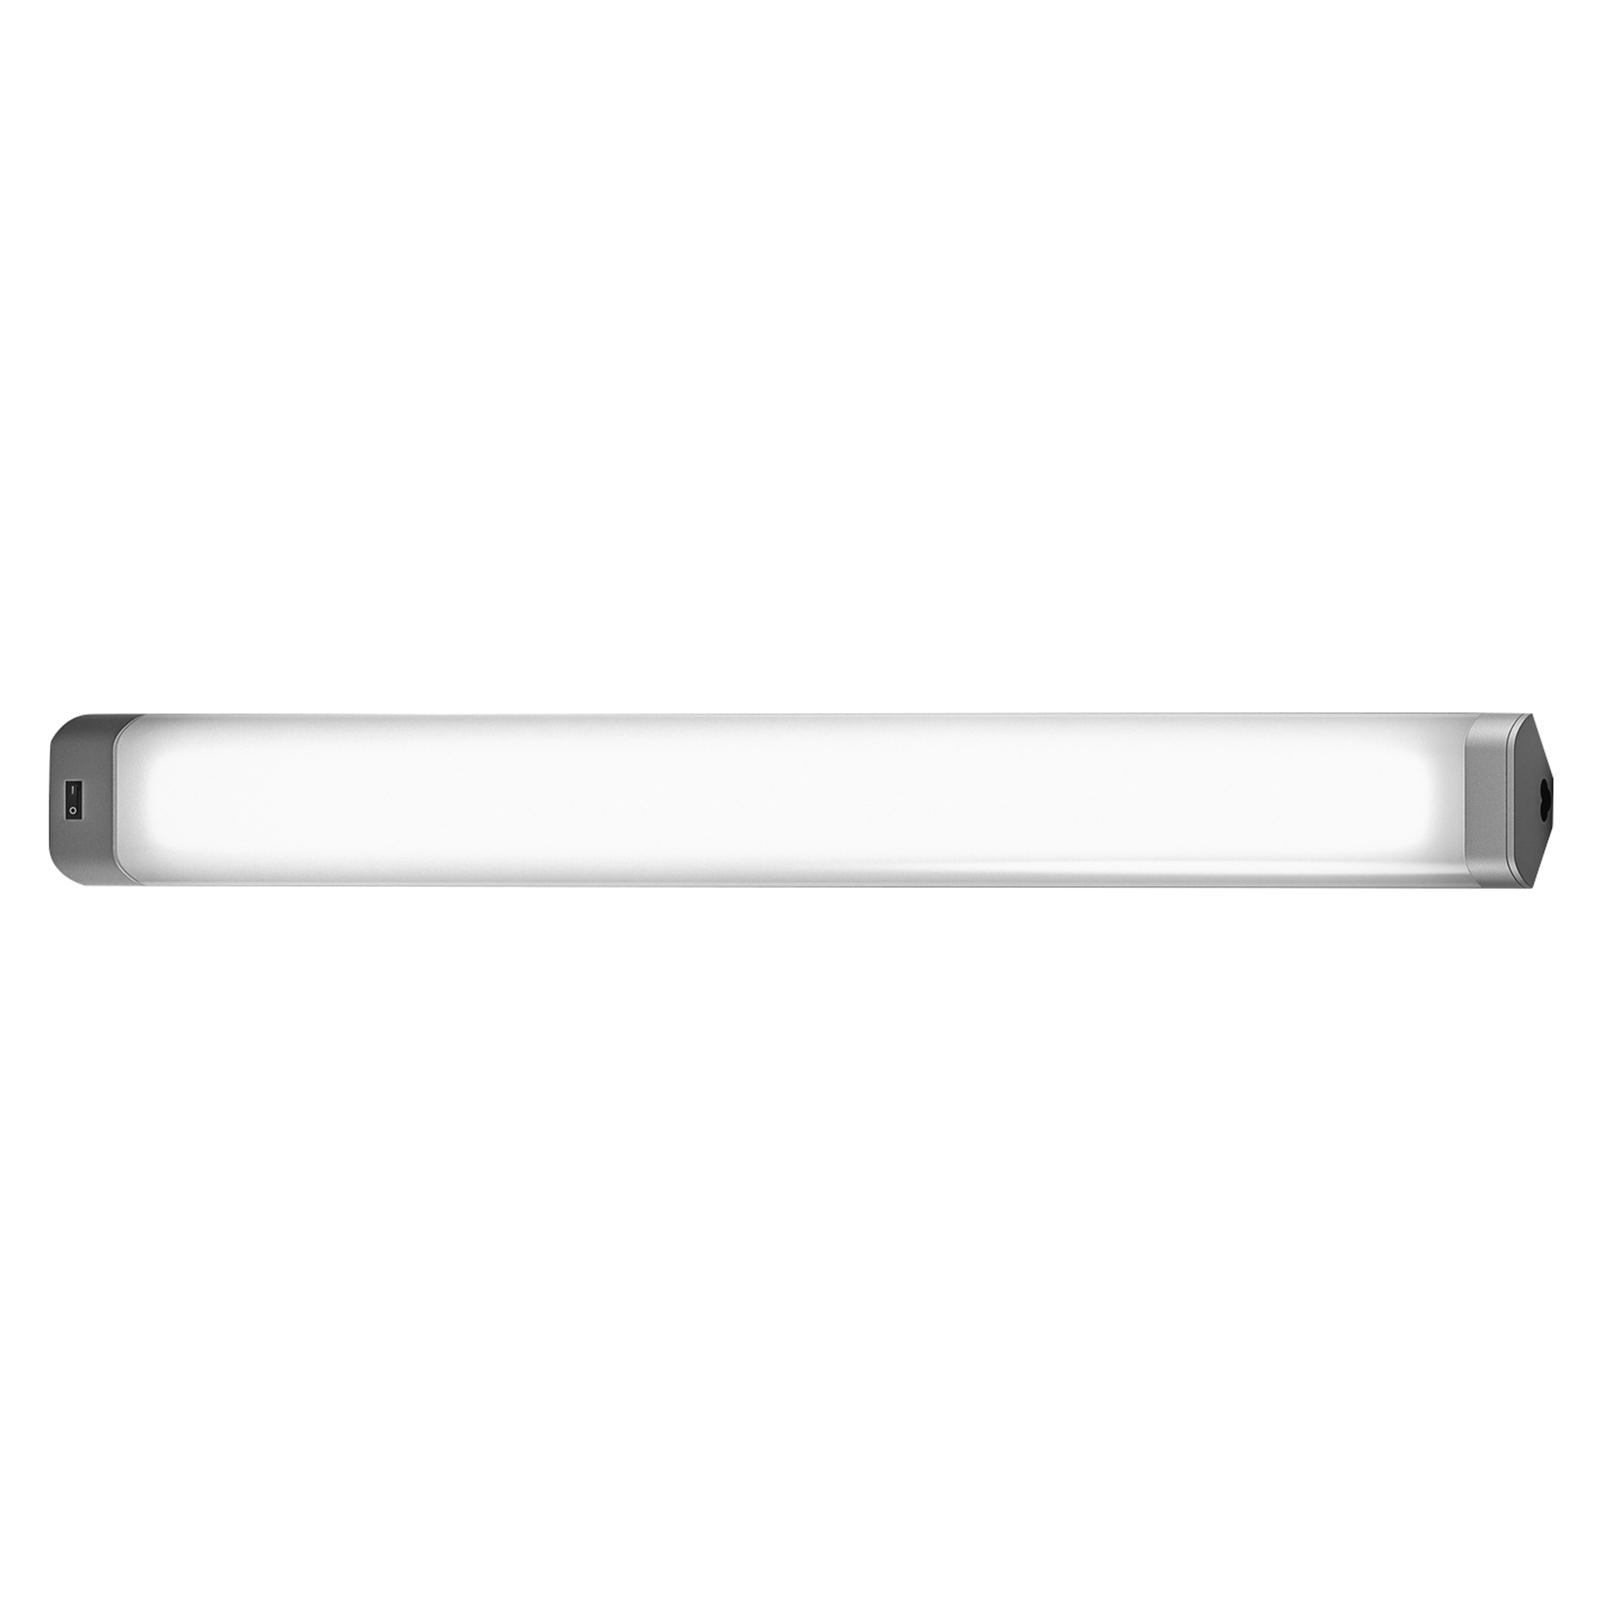 LEDVANCE Linear LED Corner-kaapinalusvalaisin 0,8m